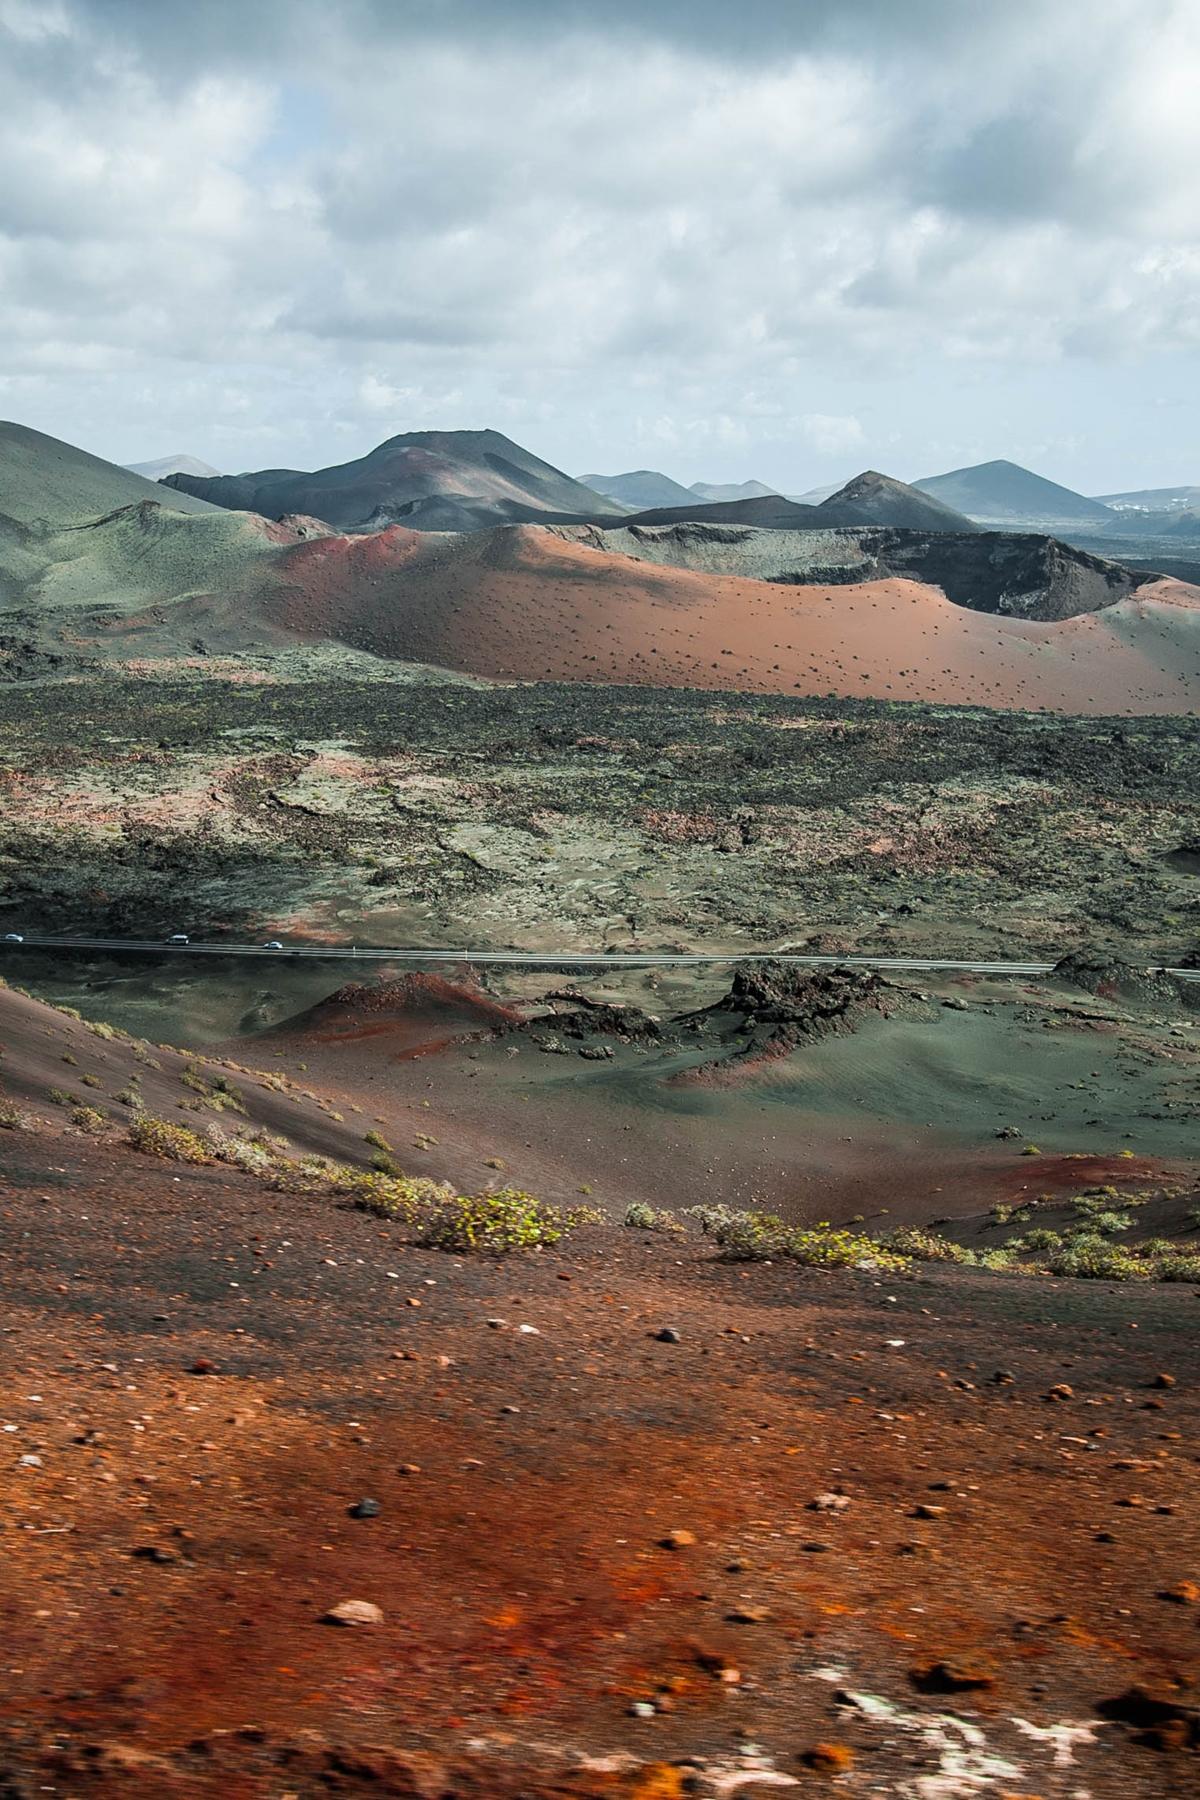 krater wulkanu Park Narodowy Timanfaya